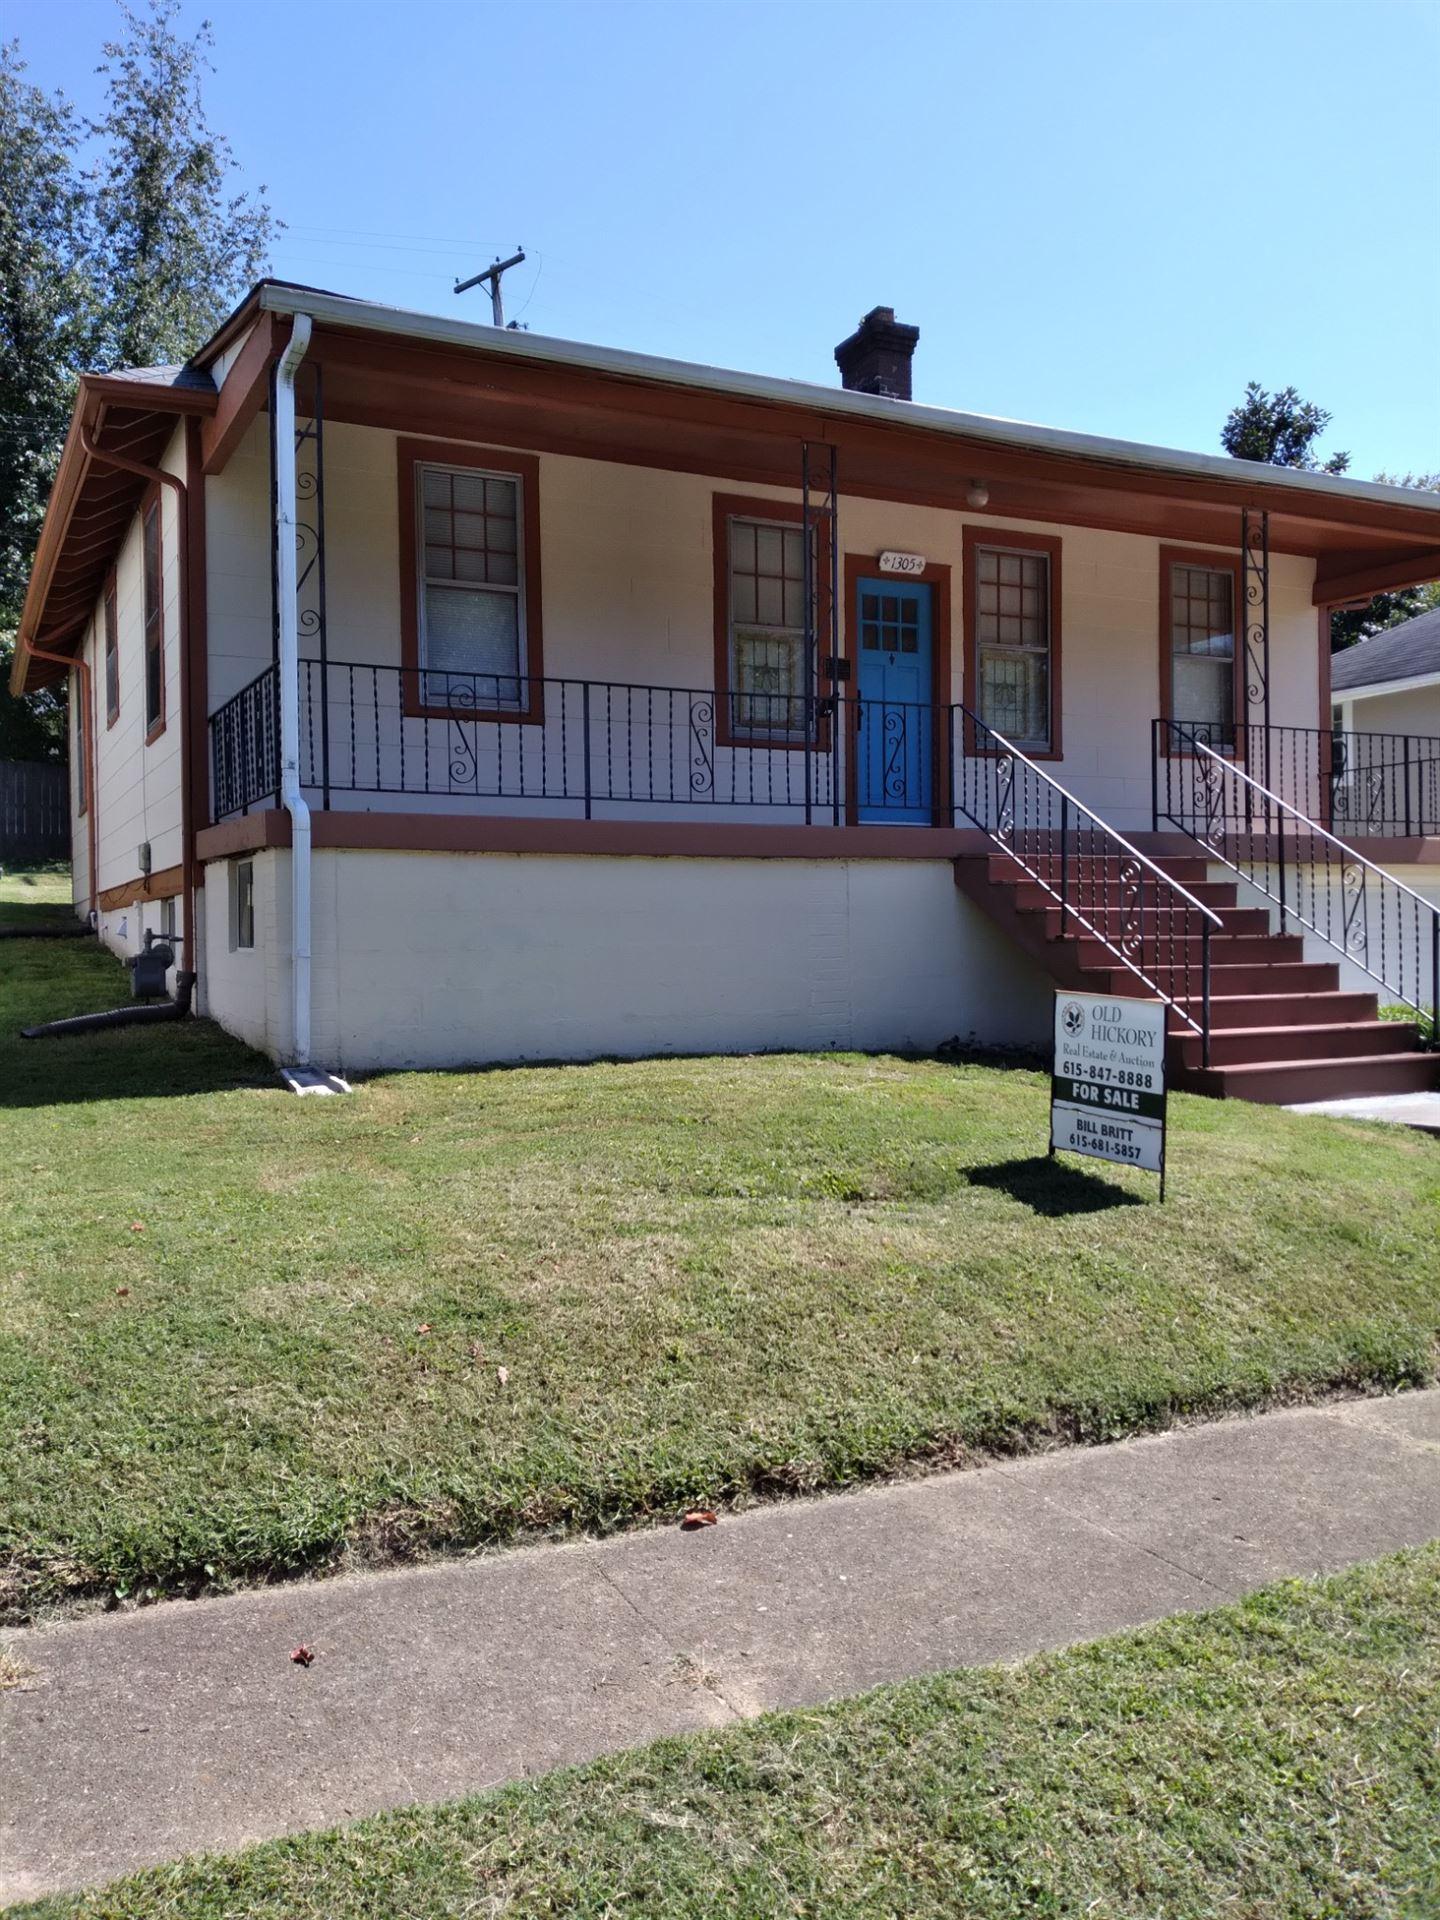 1305 Jones St, Old Hickory, TN 37138 - MLS#: 2182249